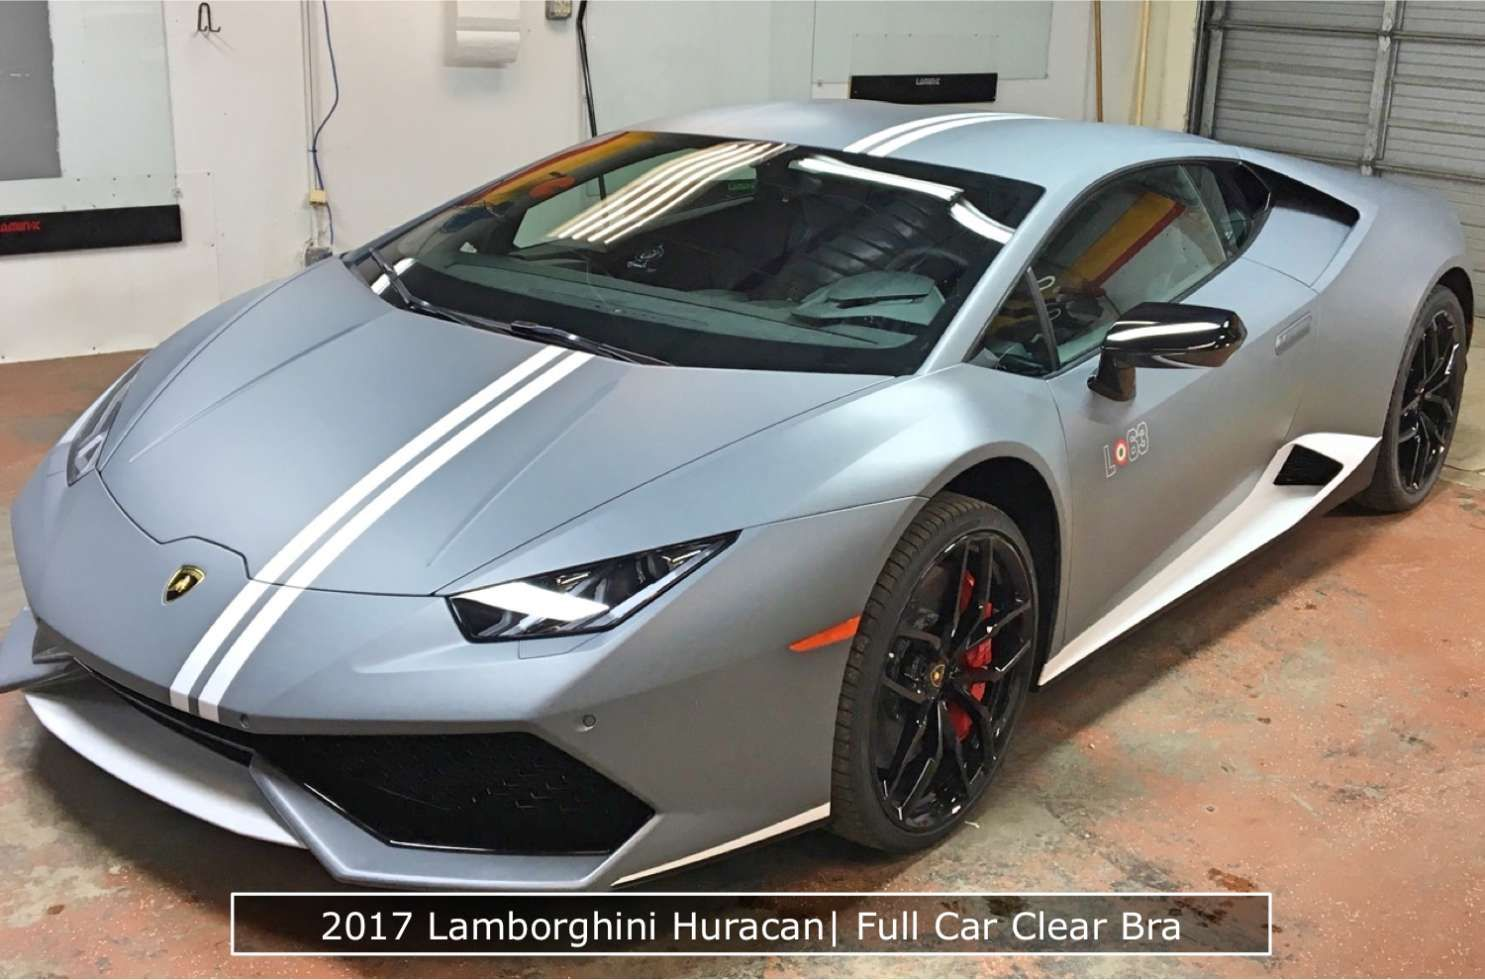 Lamborghini-Huracan-Clear-Bra